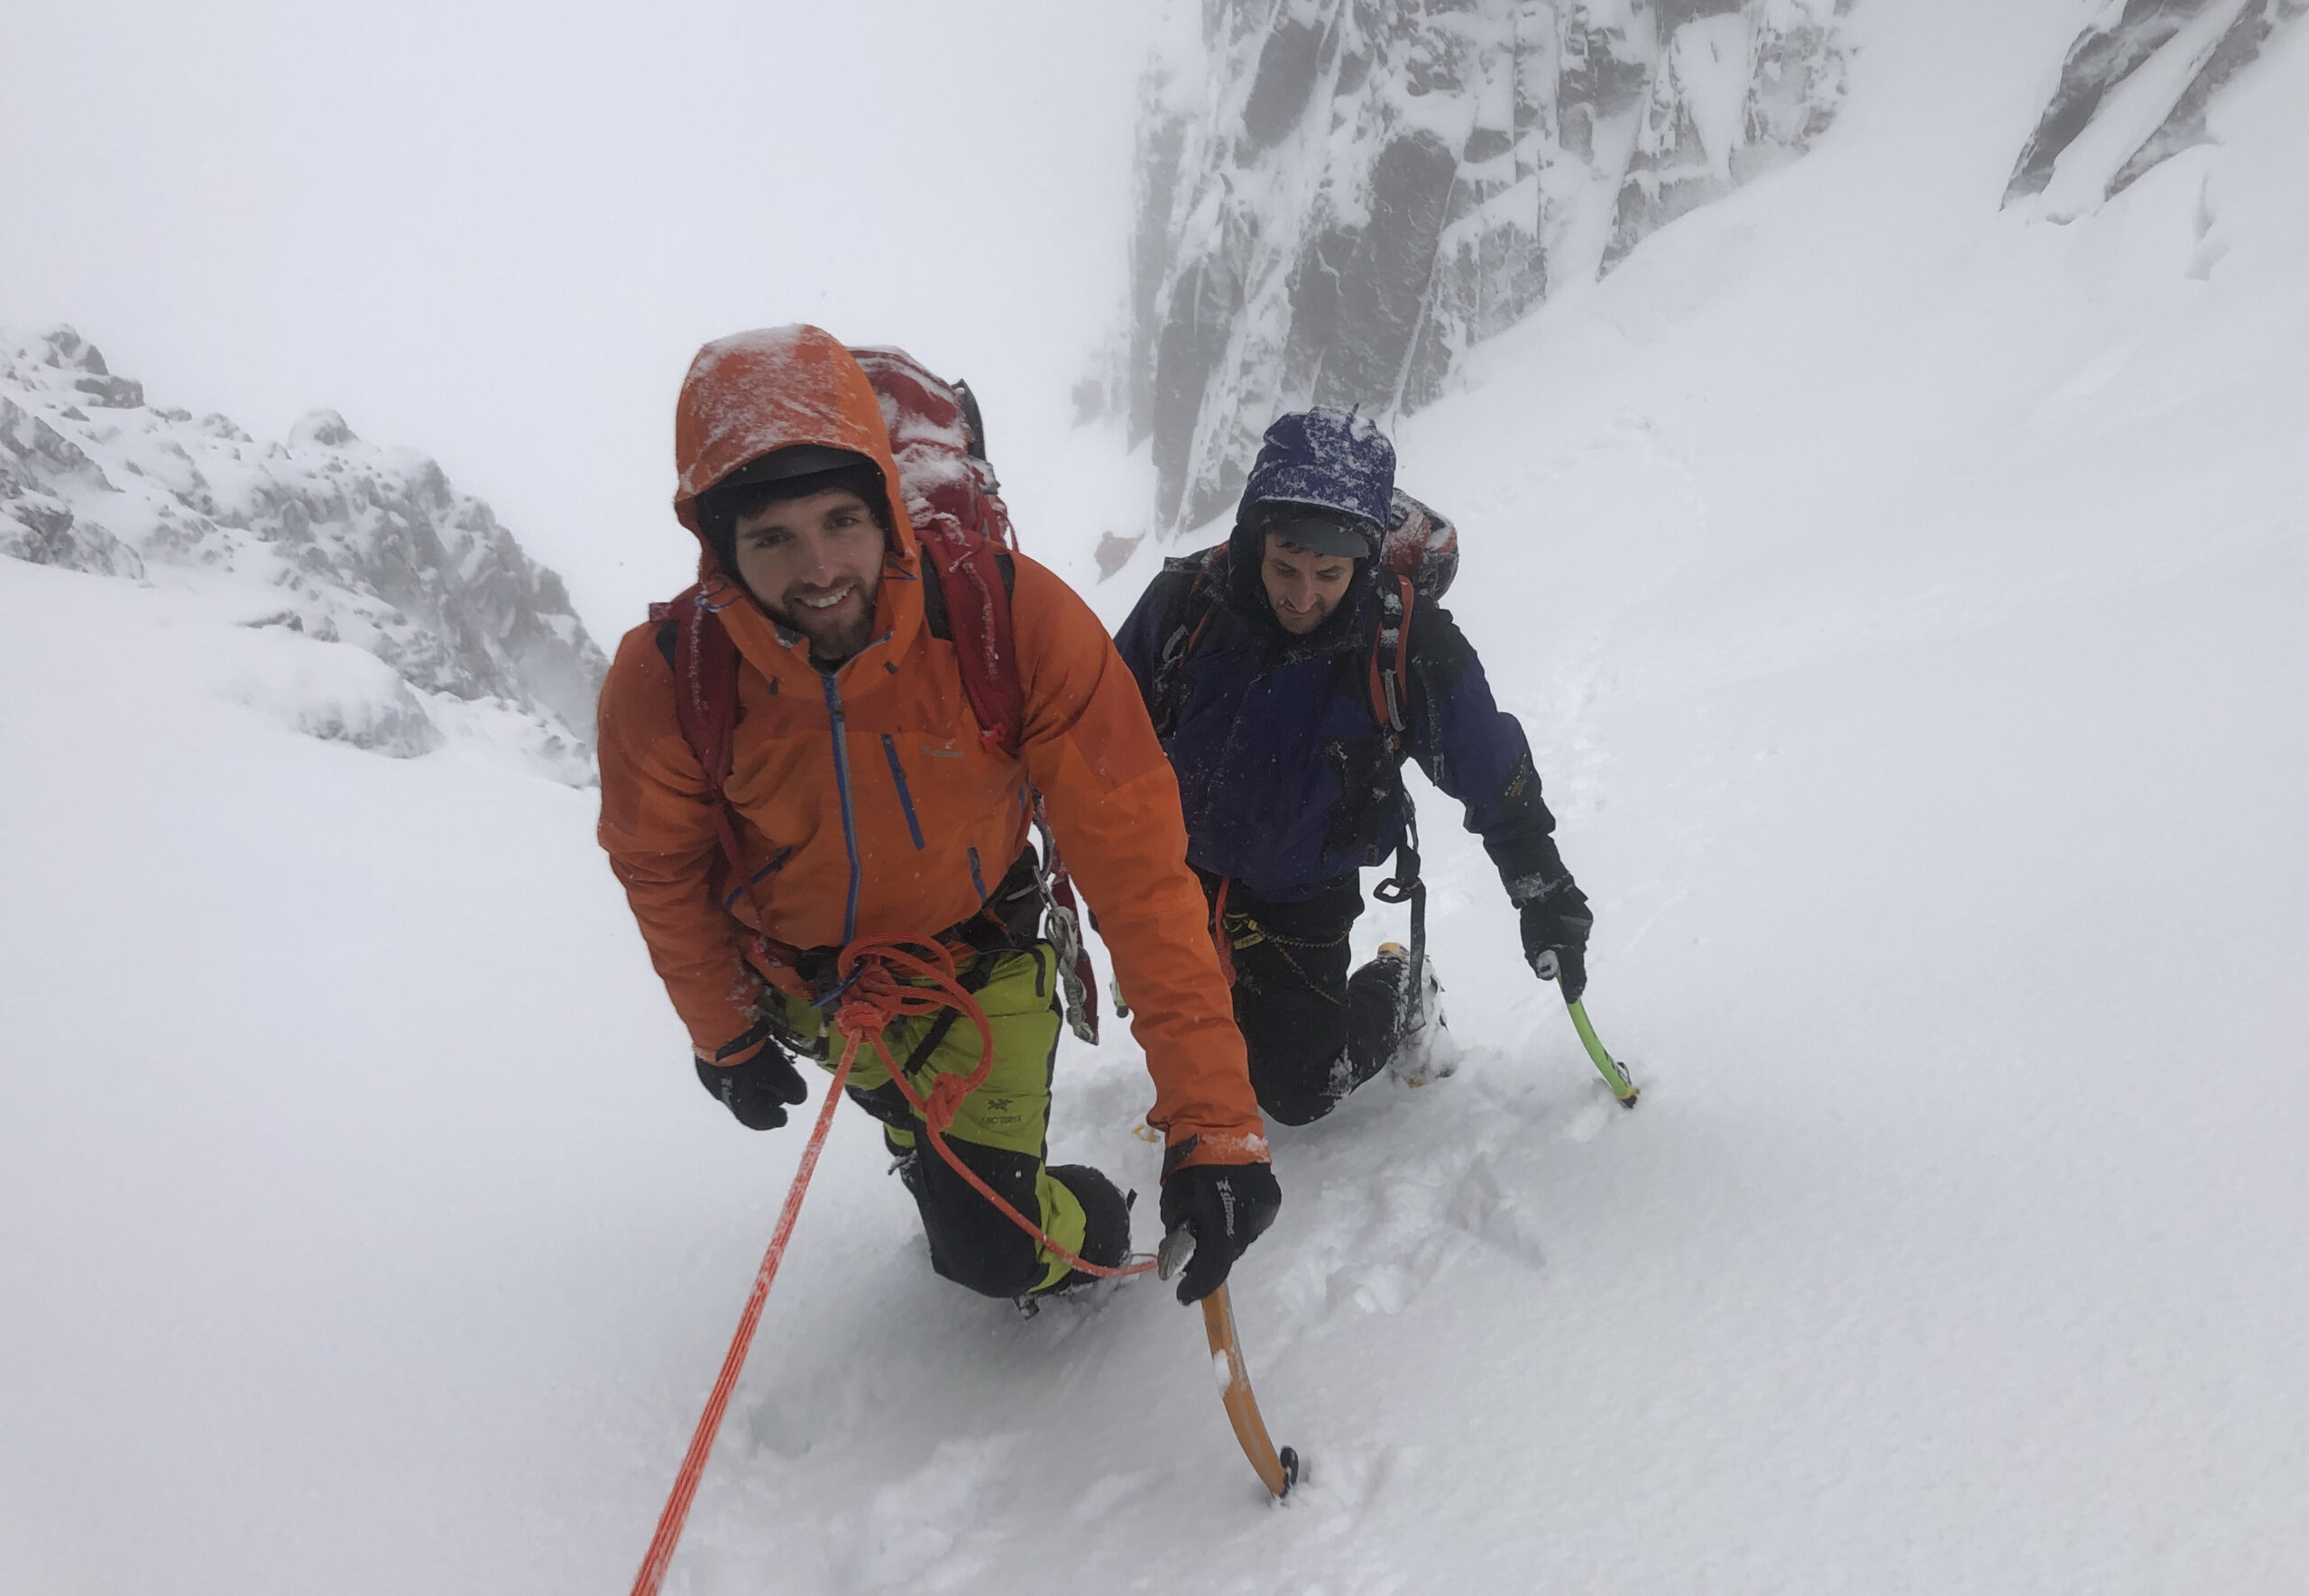 Winter Mountaineering in Scotland